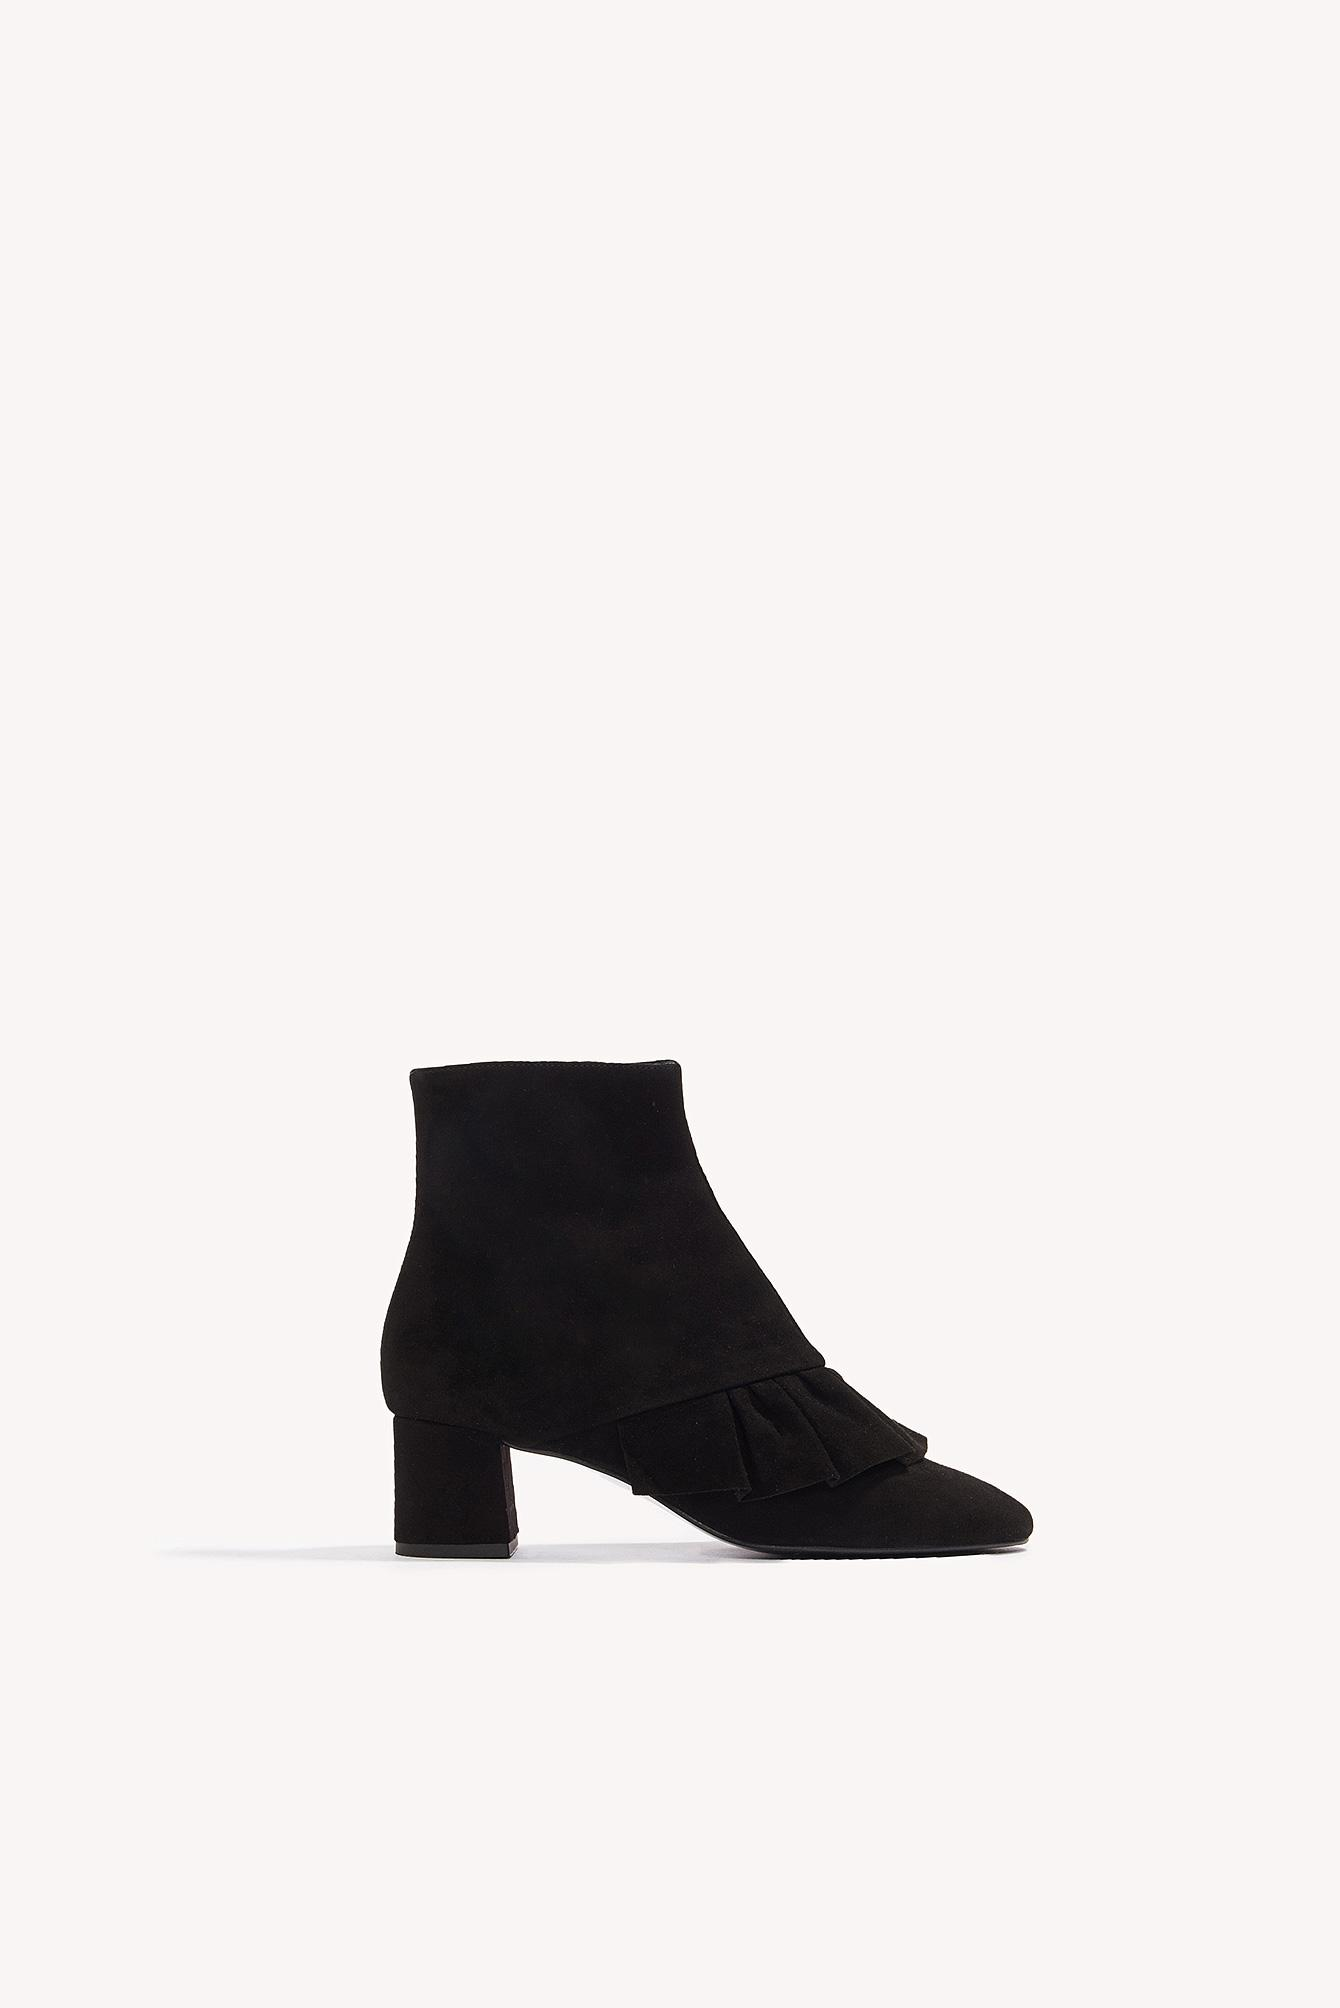 Henry Kole Micha Suede Boots in Black